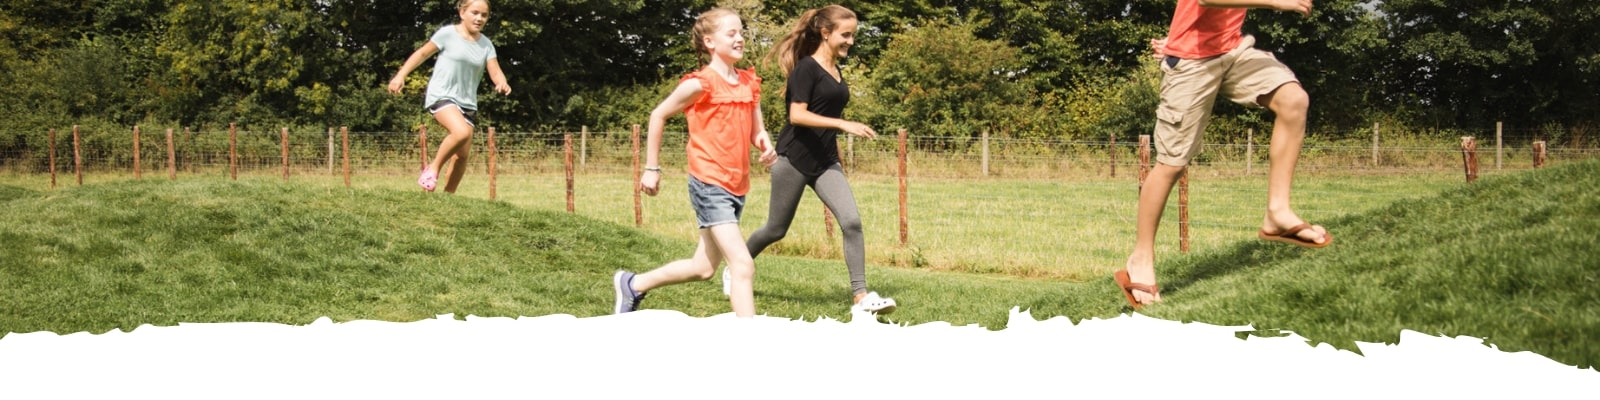 https://www.airfield.ie/wp-content/uploads/2019/07/Kids-Running-At-Airfield-Estate-min.jpg